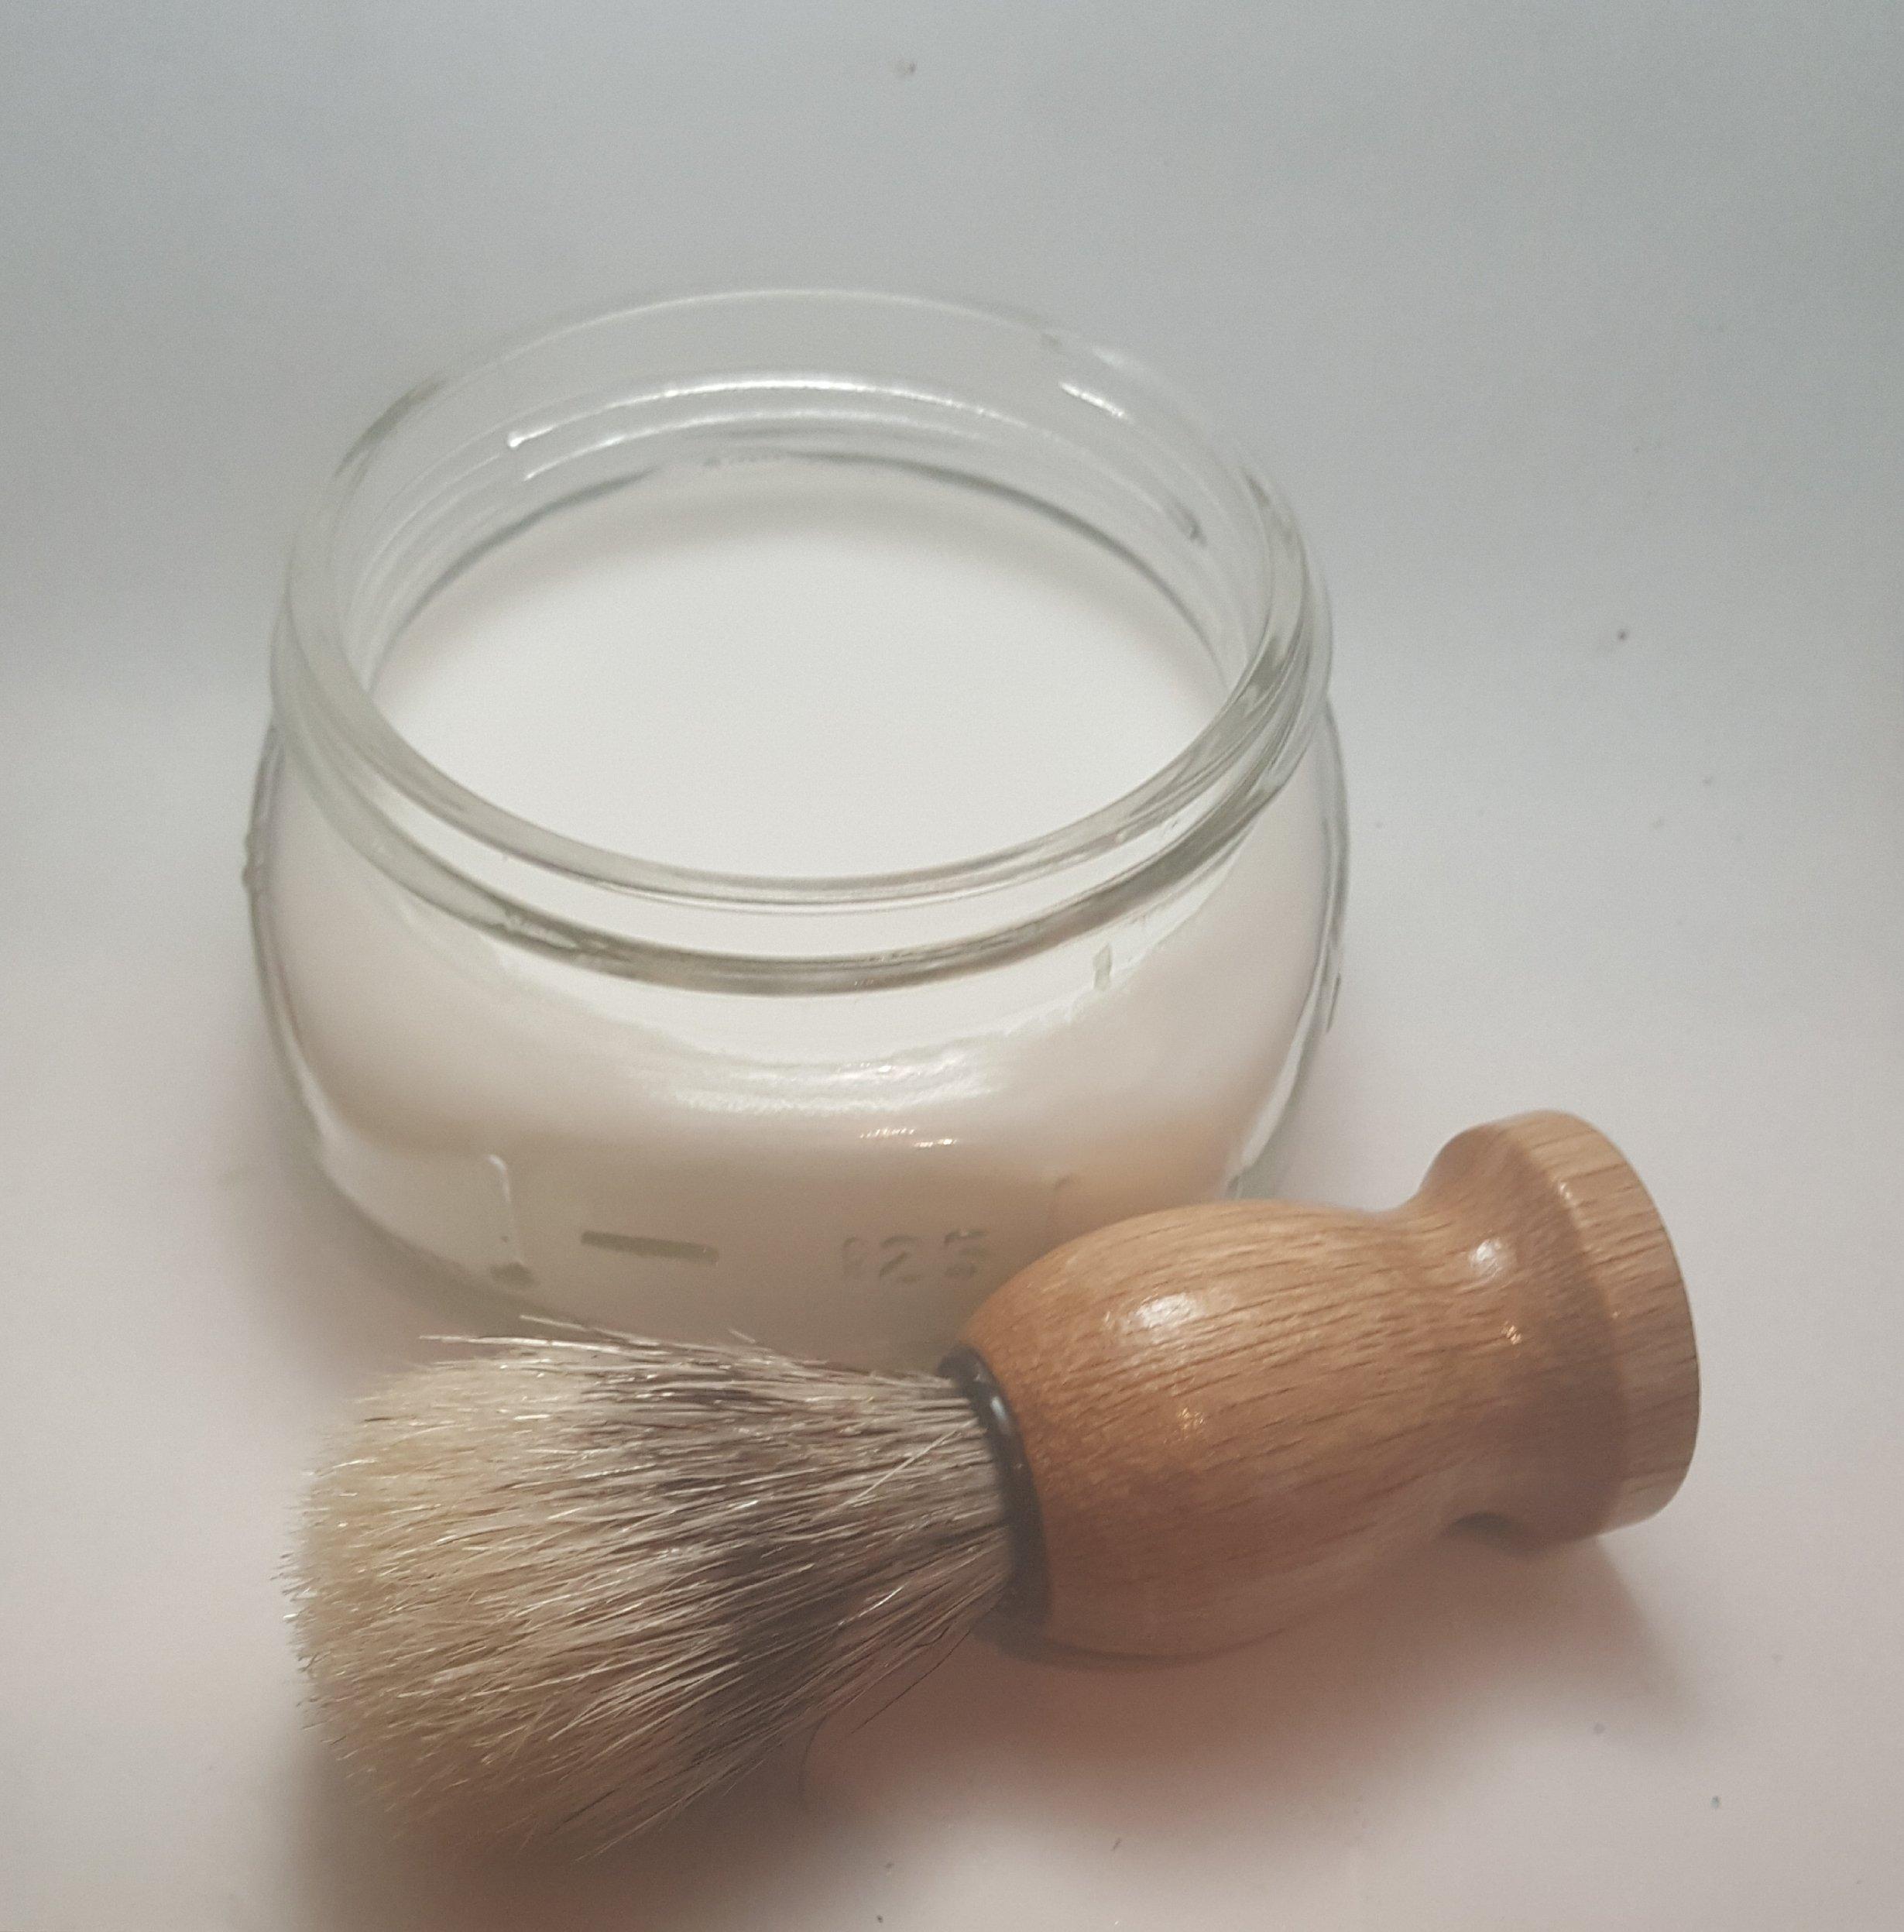 Men's Shaving Soap with Lather Brush